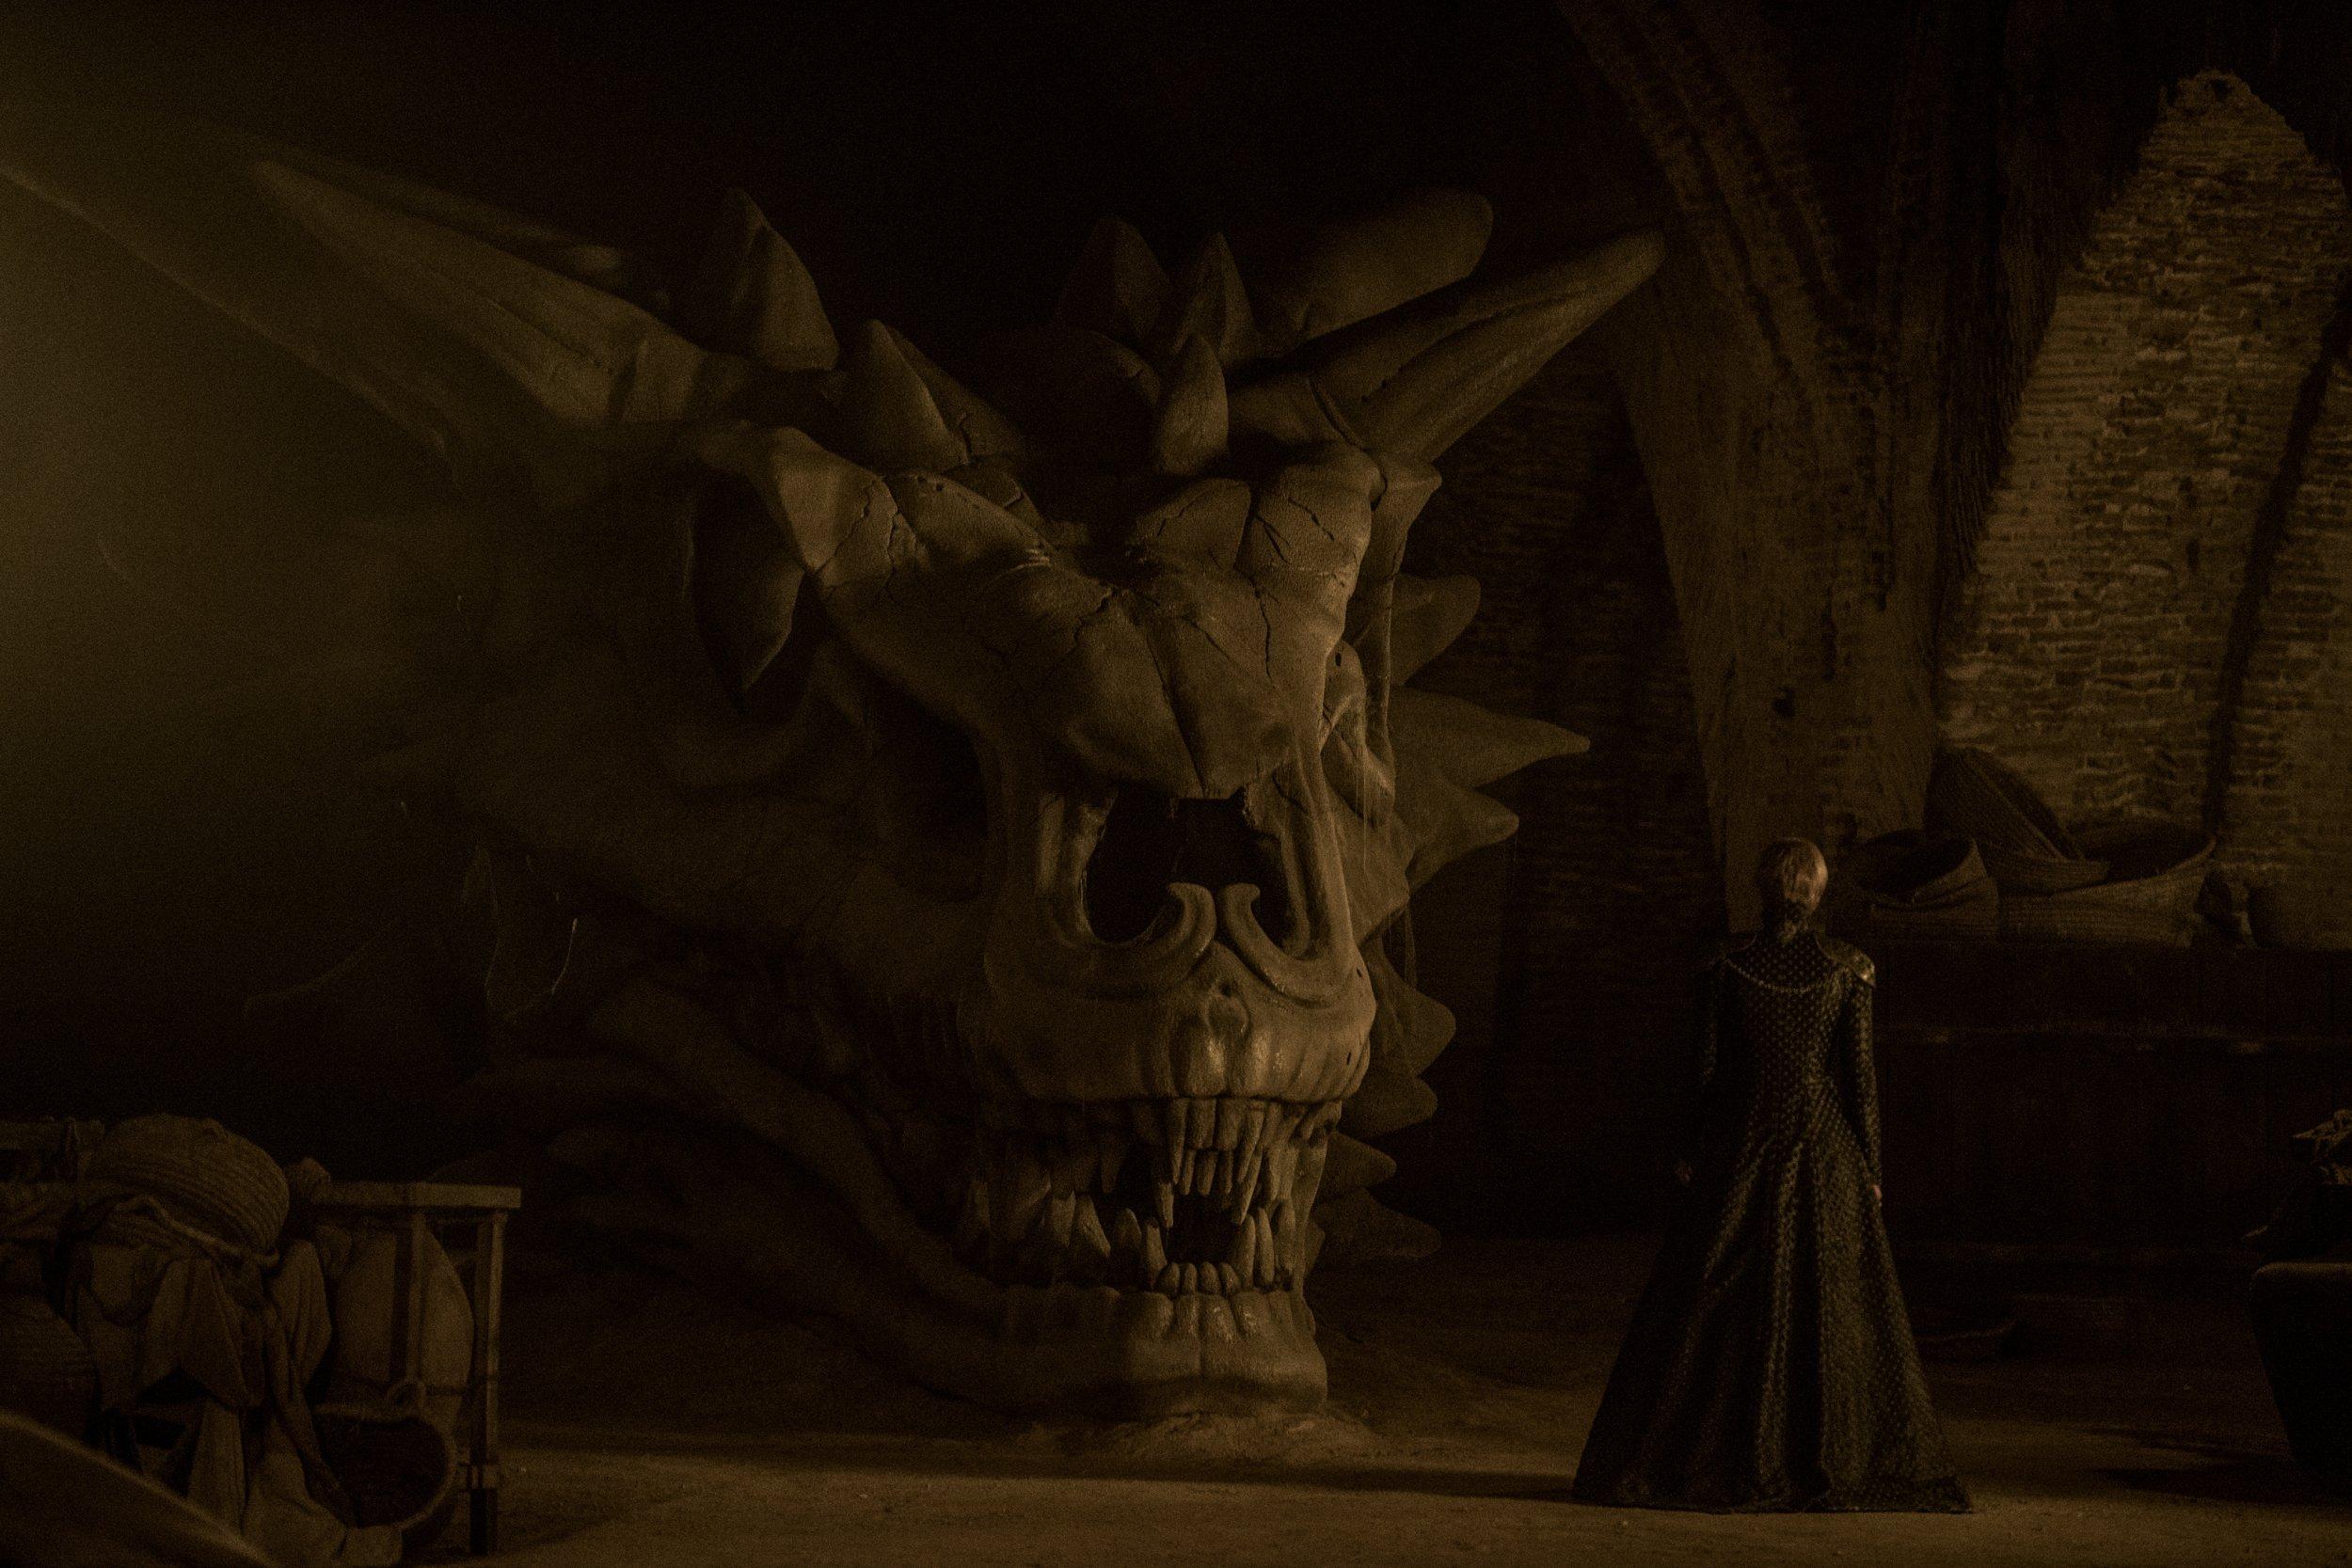 Game Of Thrones Season 7 Episode 2 Things You Missed In